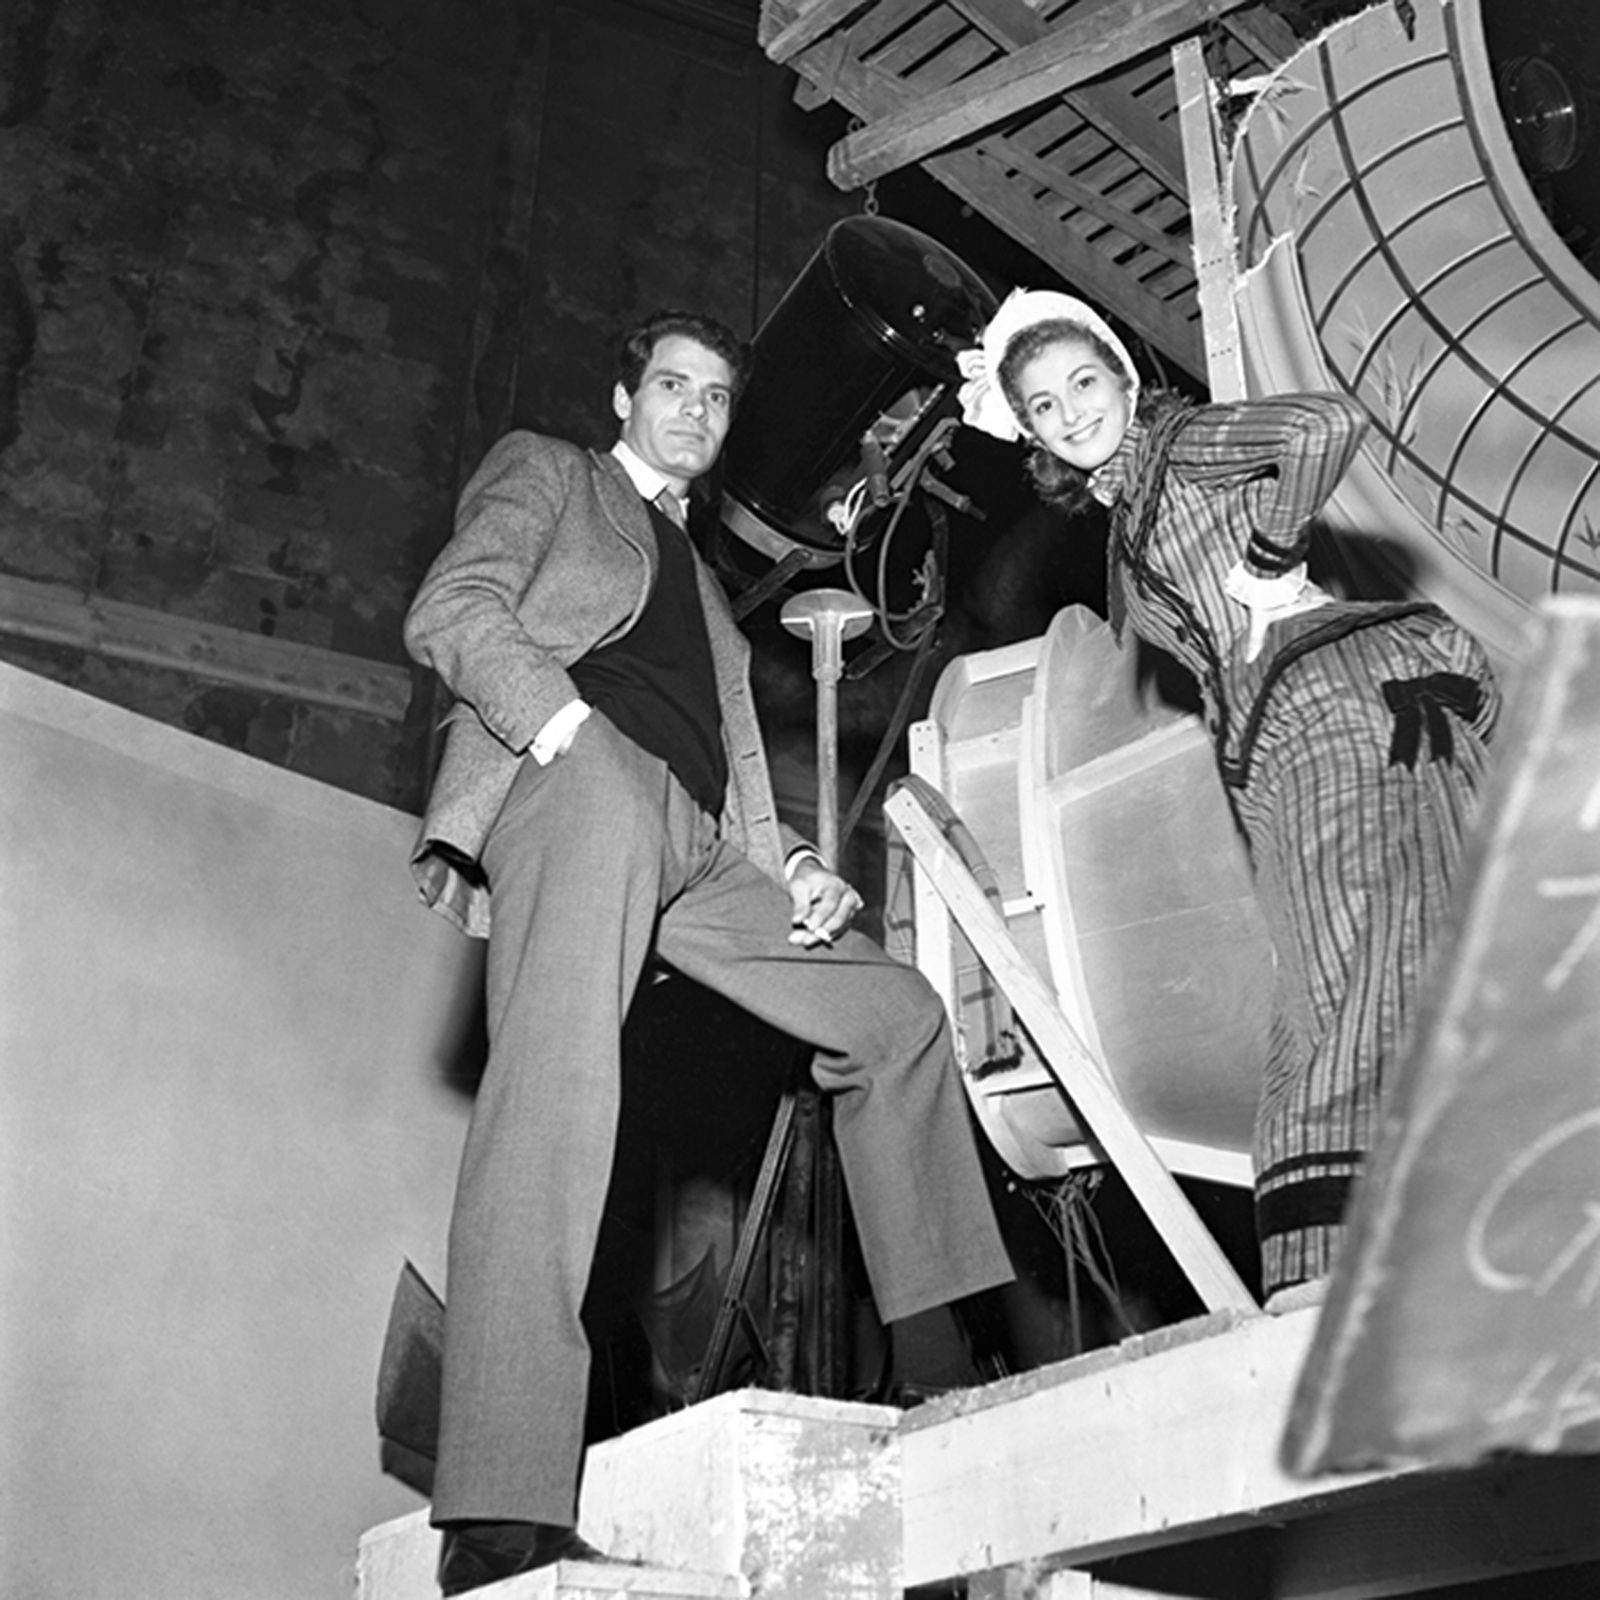 Anna-Maria PIER-ANGELi sur le tournage du Film 'Mam'zelle Nitouche' de Yves Allegret. 1954 - Courtesy Studio Willy RIZZO